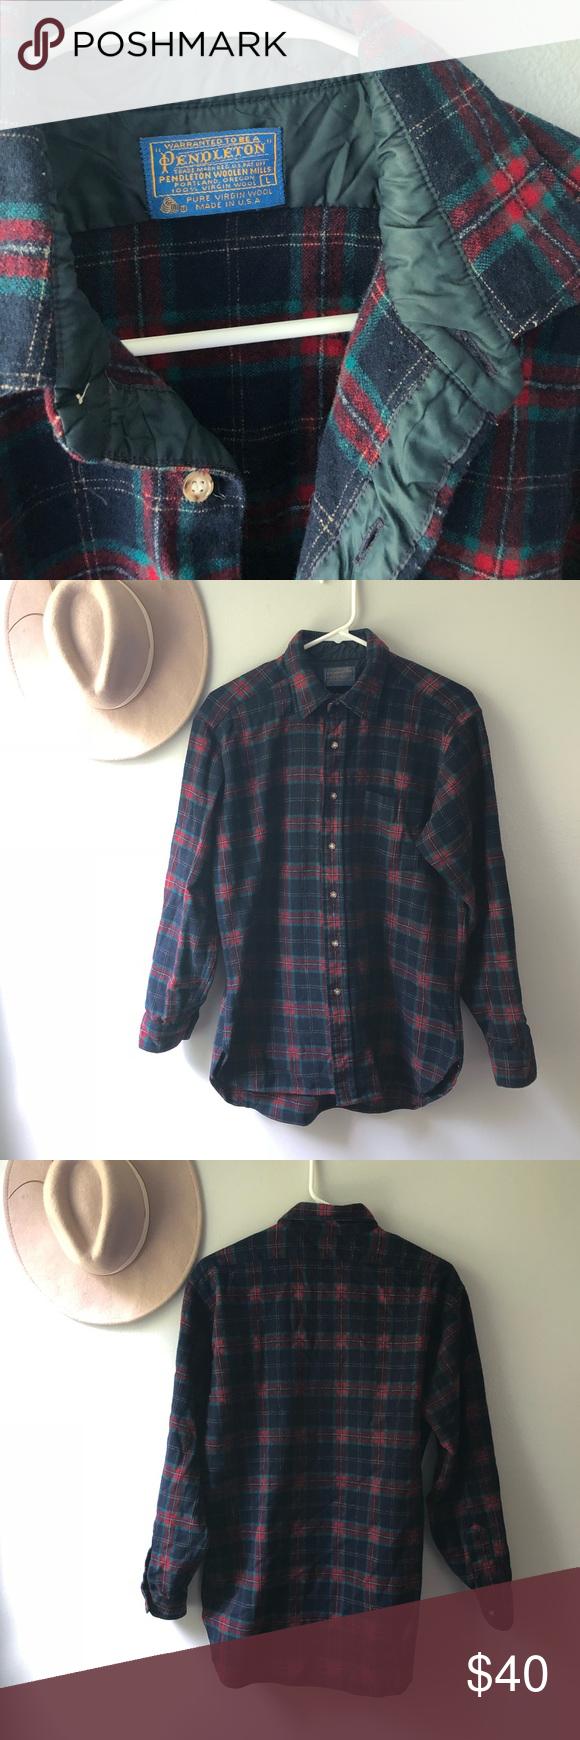 Flannel shirt vintage  Vintage Pendleton flannel shirt  My Posh Closet  Pinterest